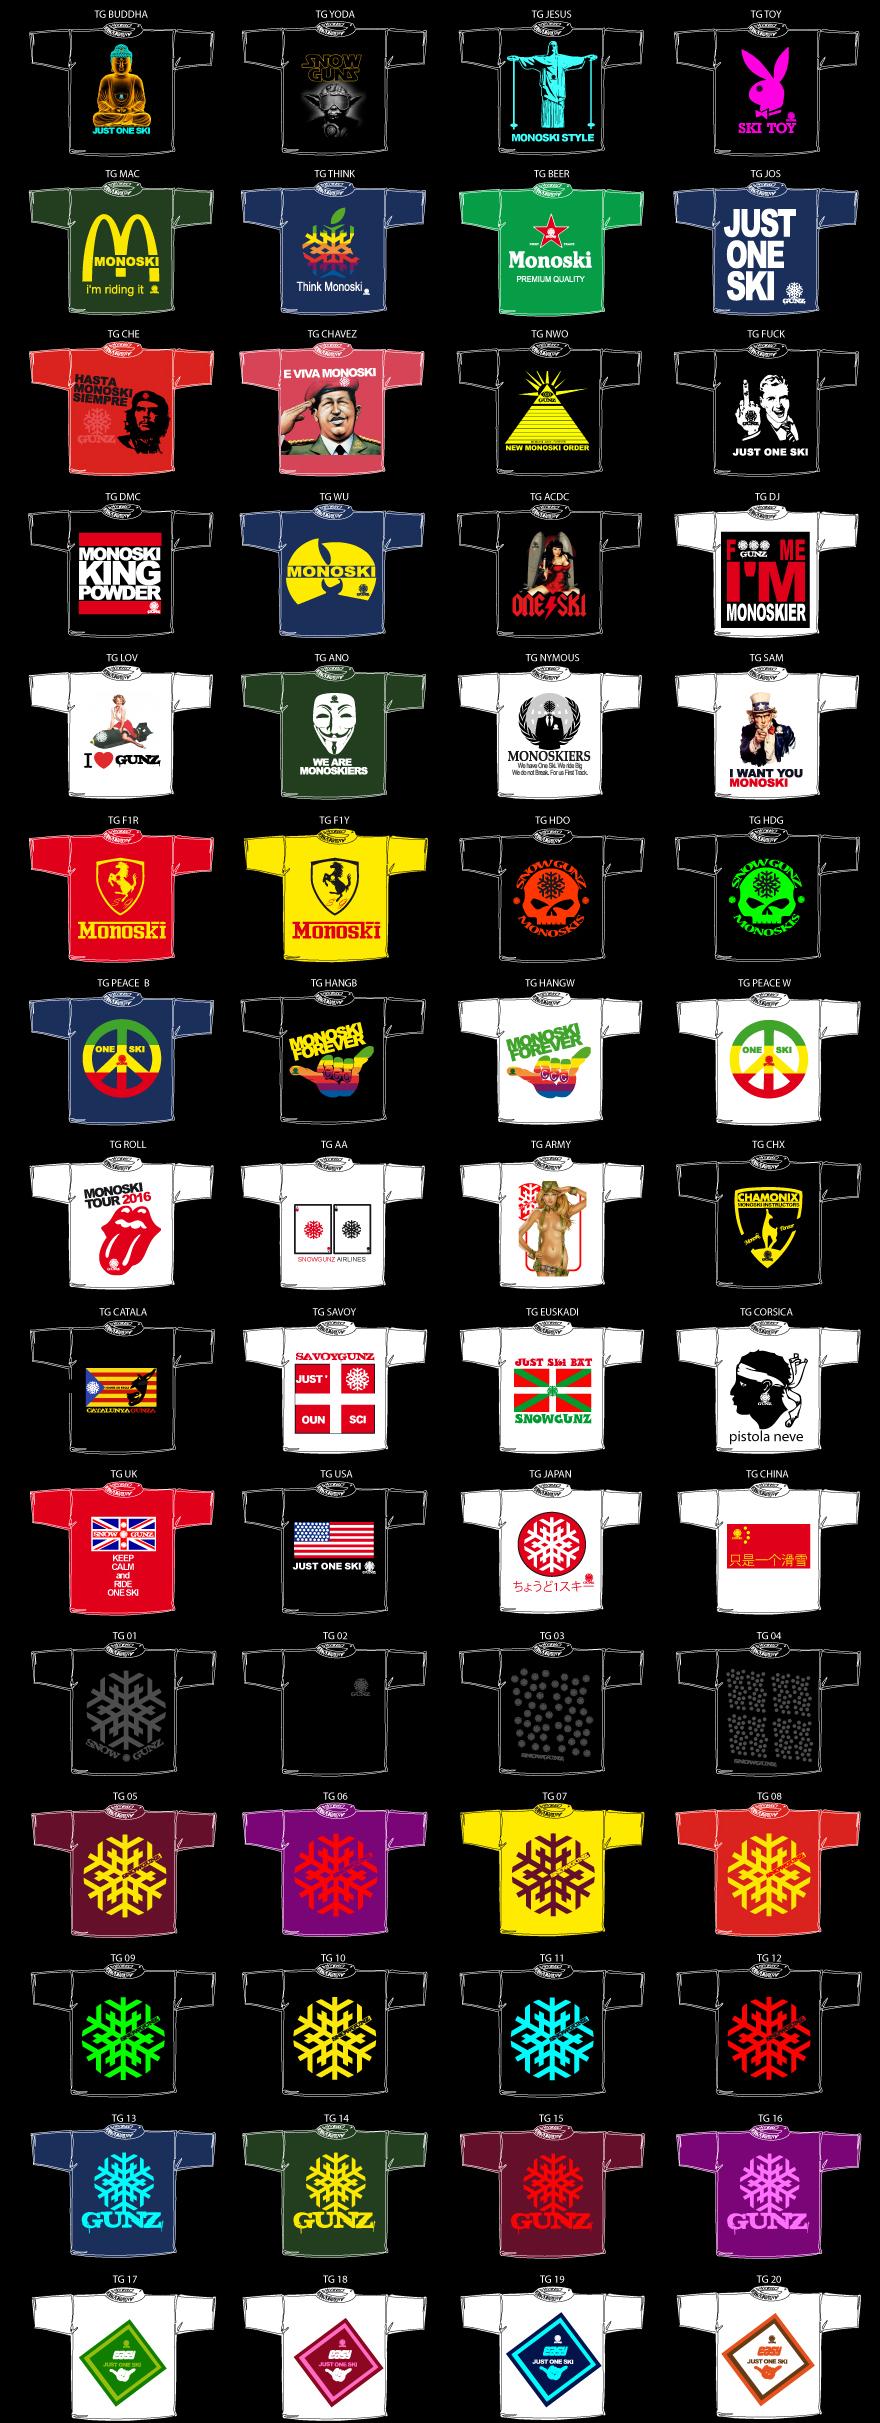 Monoski-Tee-Shirt-2014.jpg